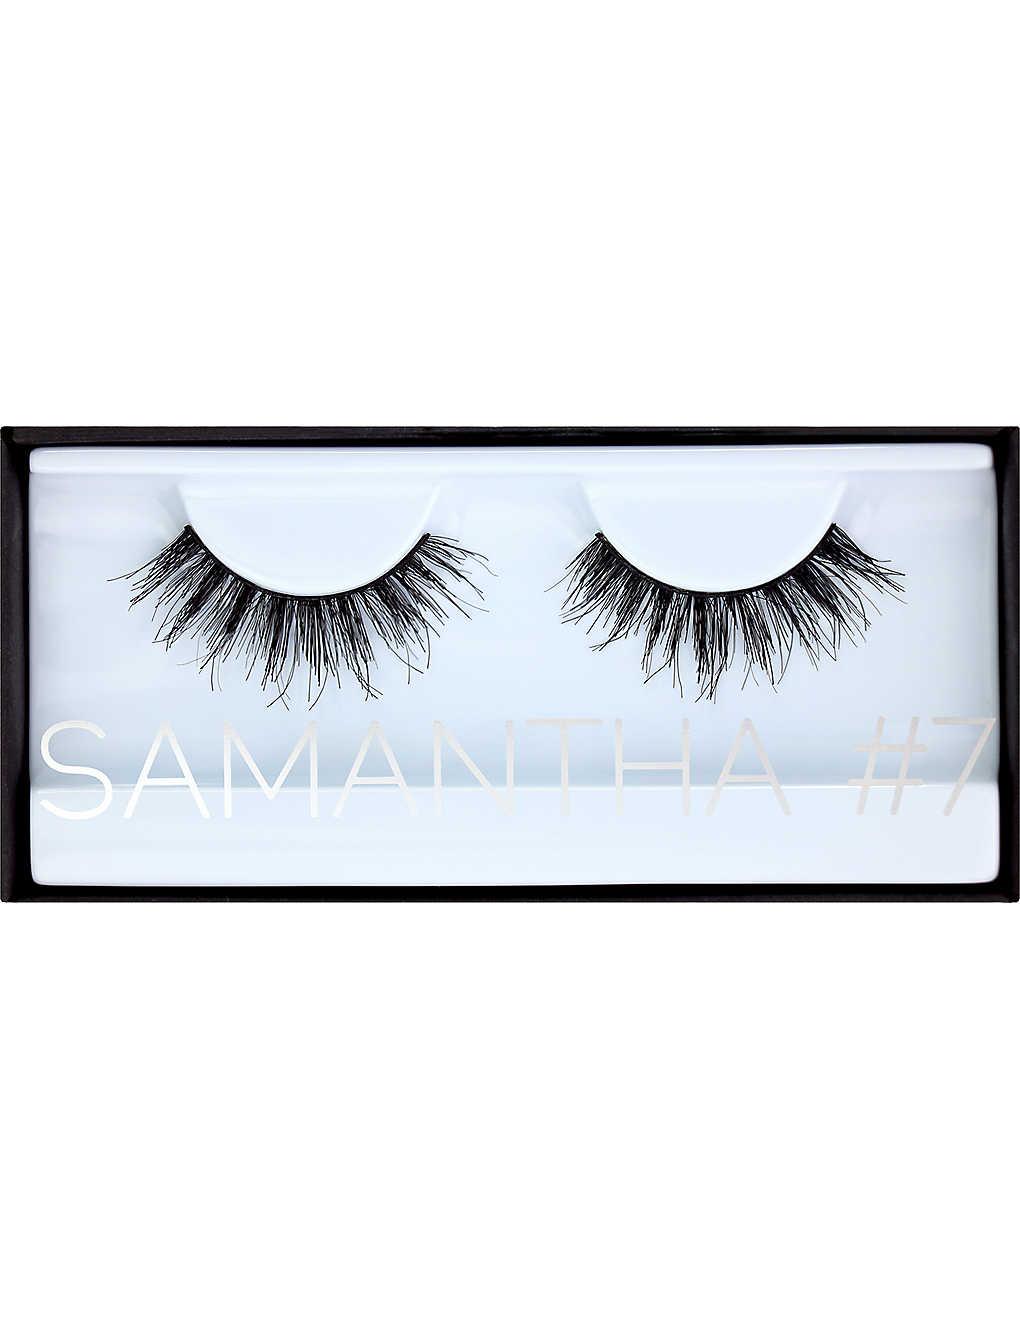 61e2c8370b8 HUDA BEAUTY - Samantha Classic Lashes #7 | Selfridges.com